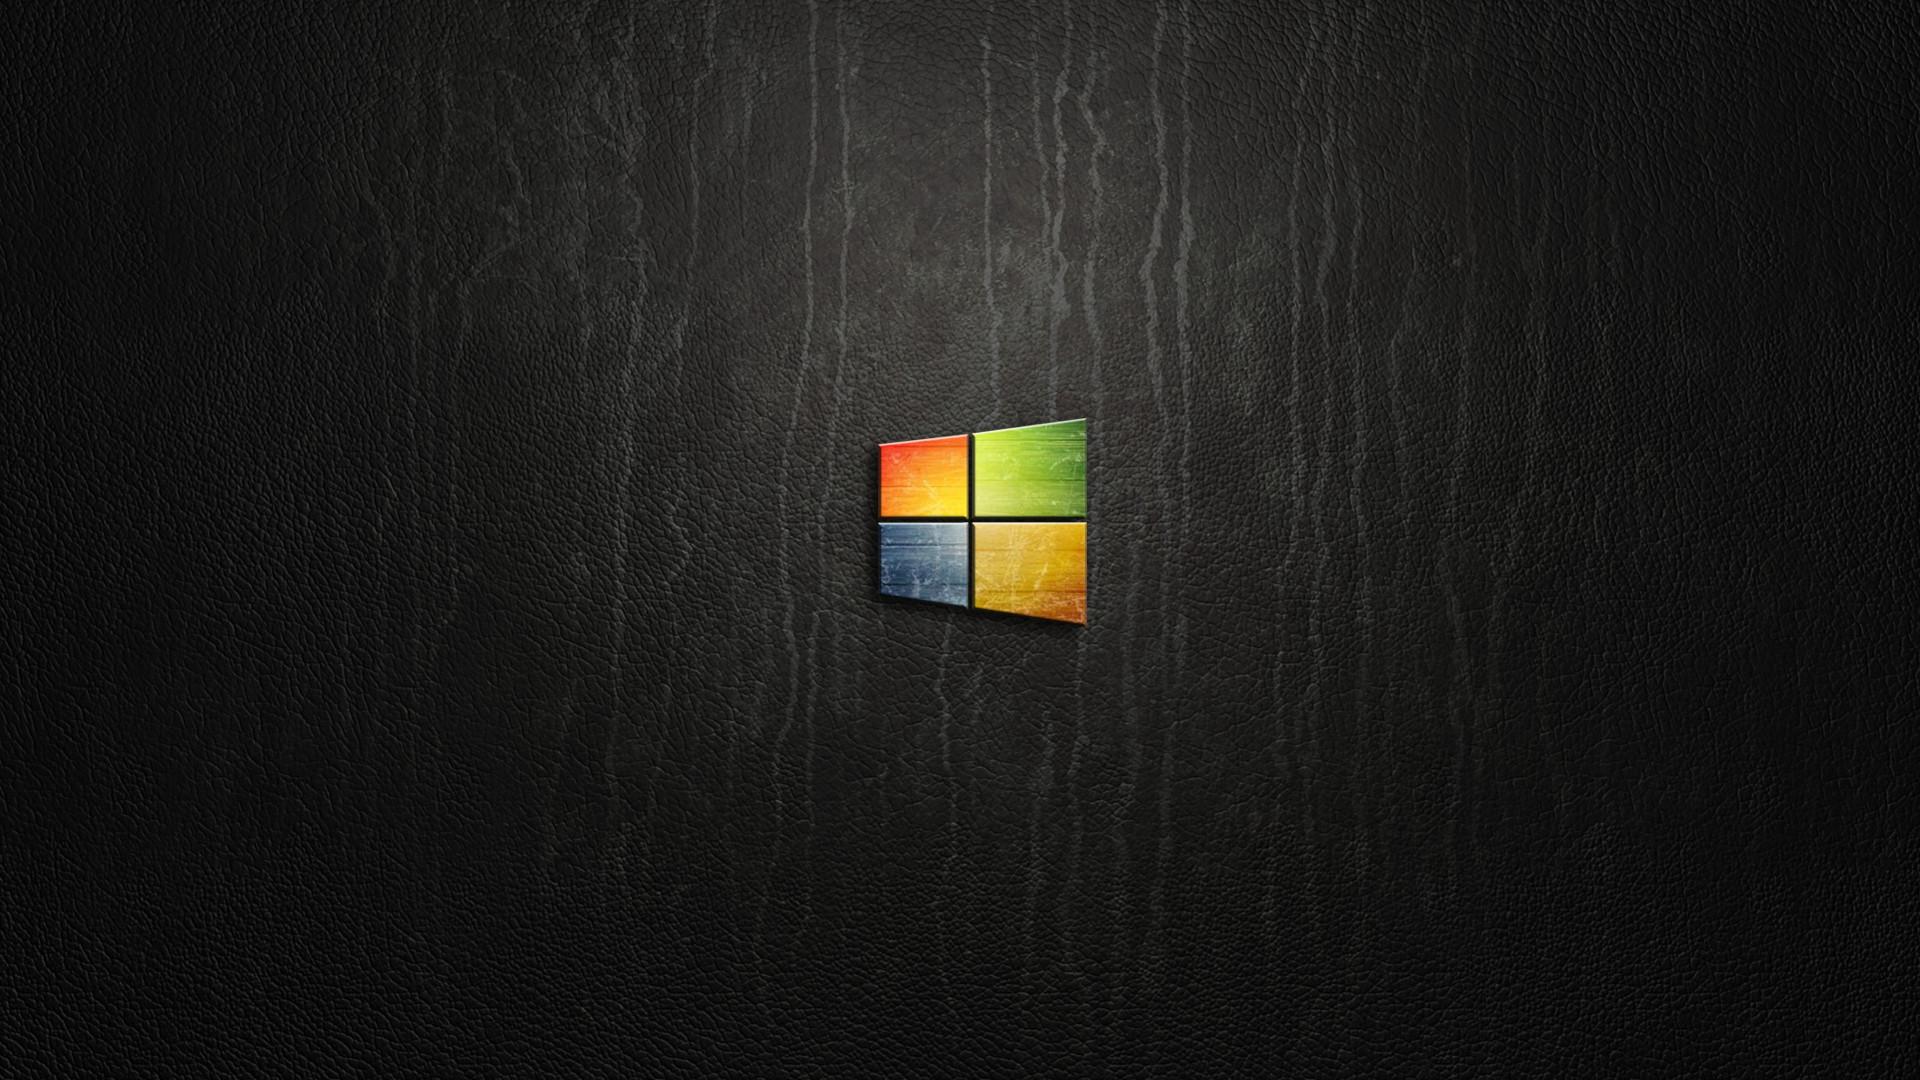 62 Acer Wallpaper 1080p Hd 1920 1080